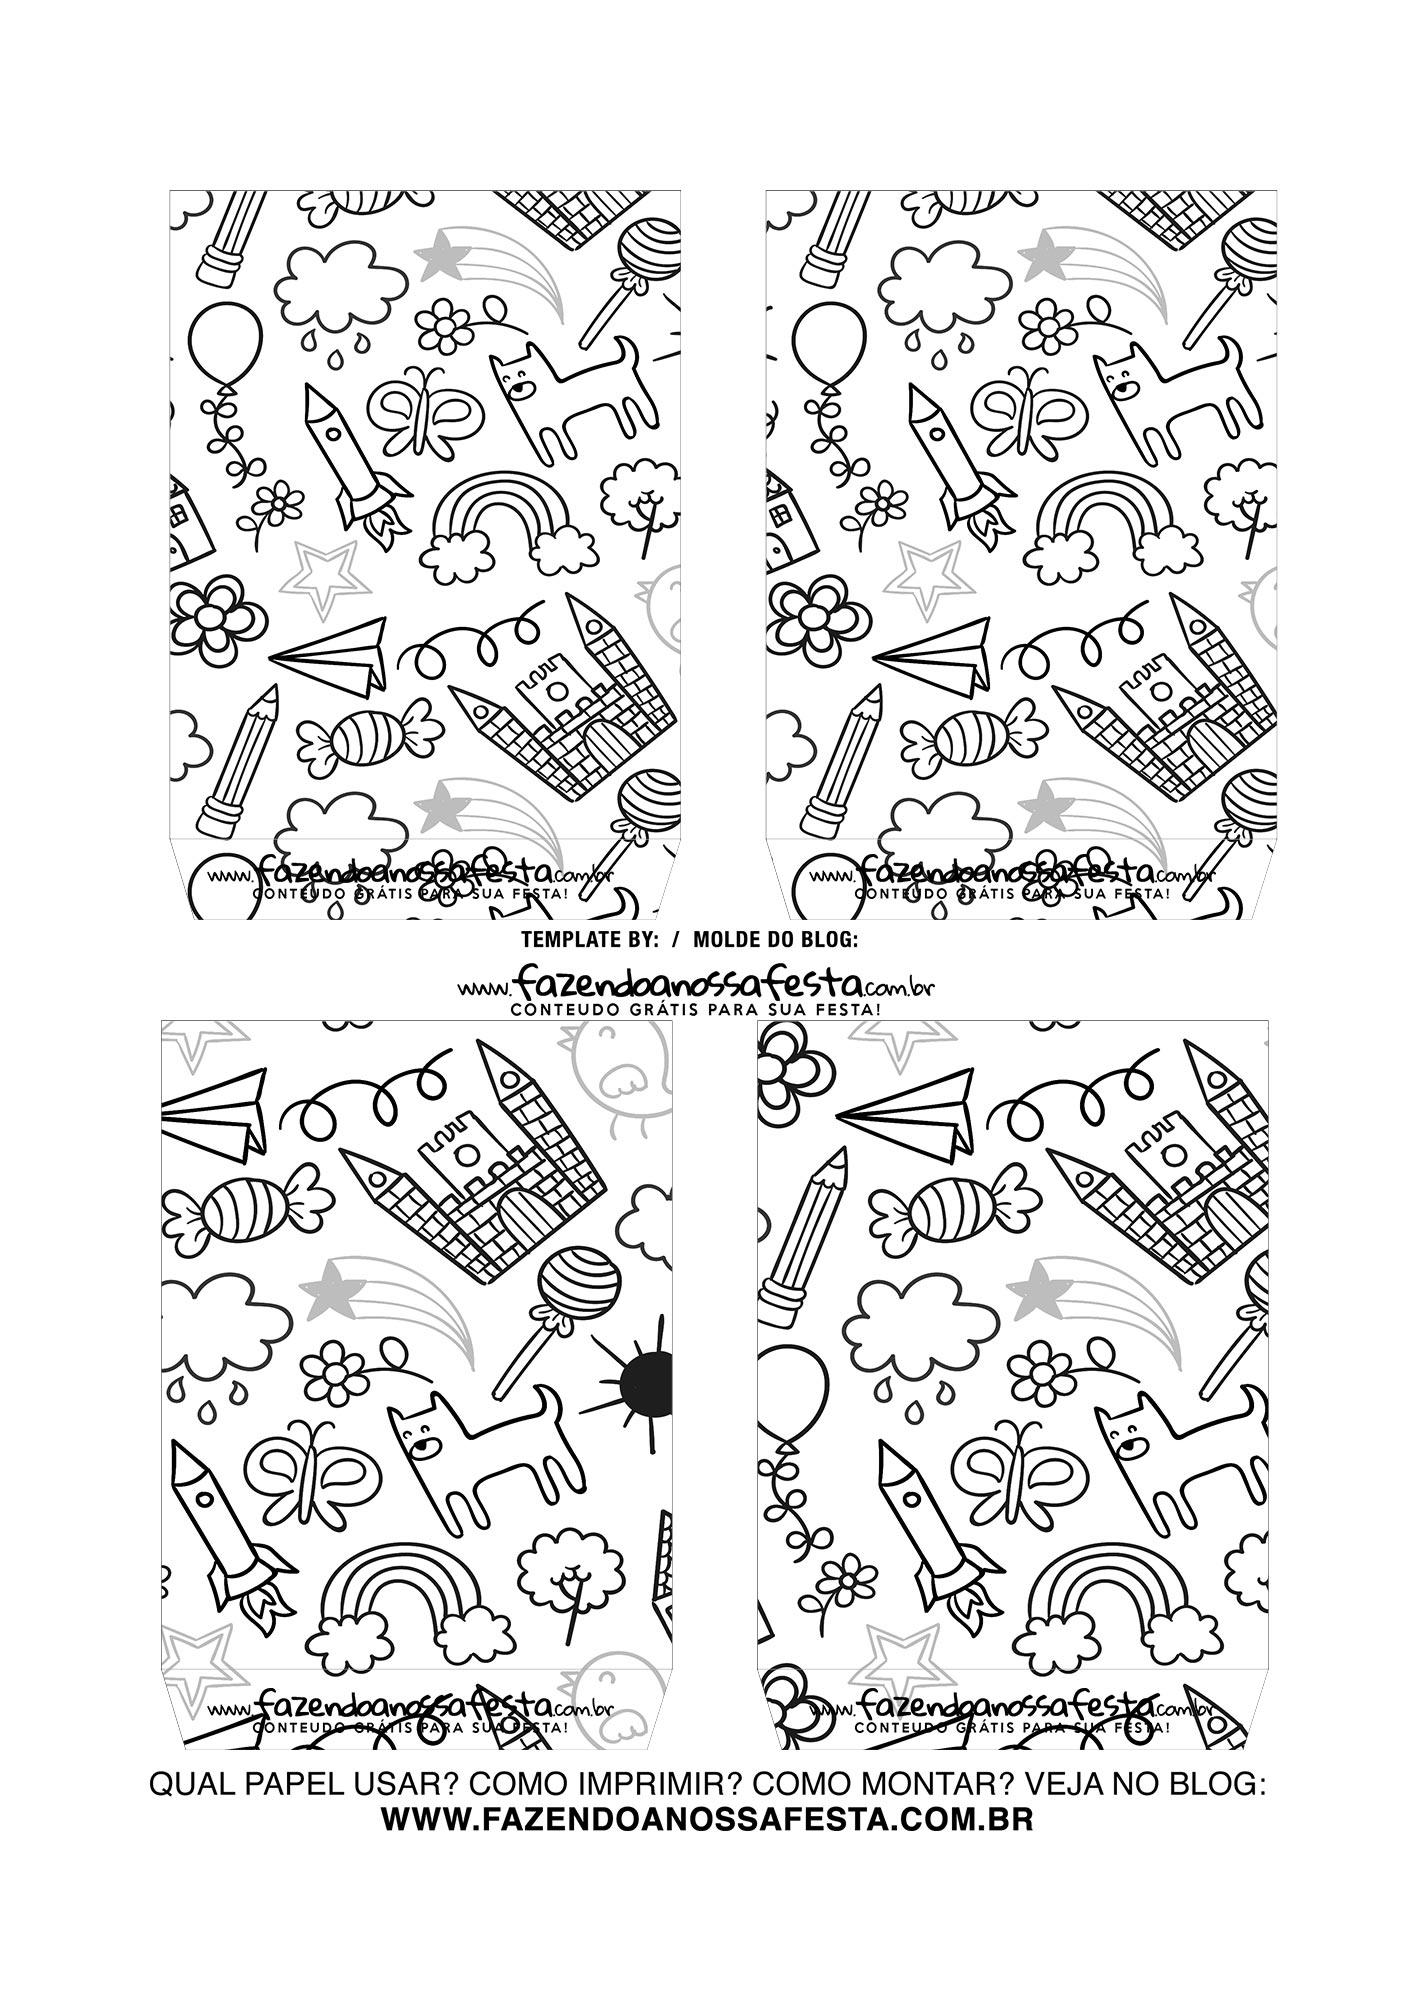 Caixa Explosiva Dia das Criancas para colorir 4